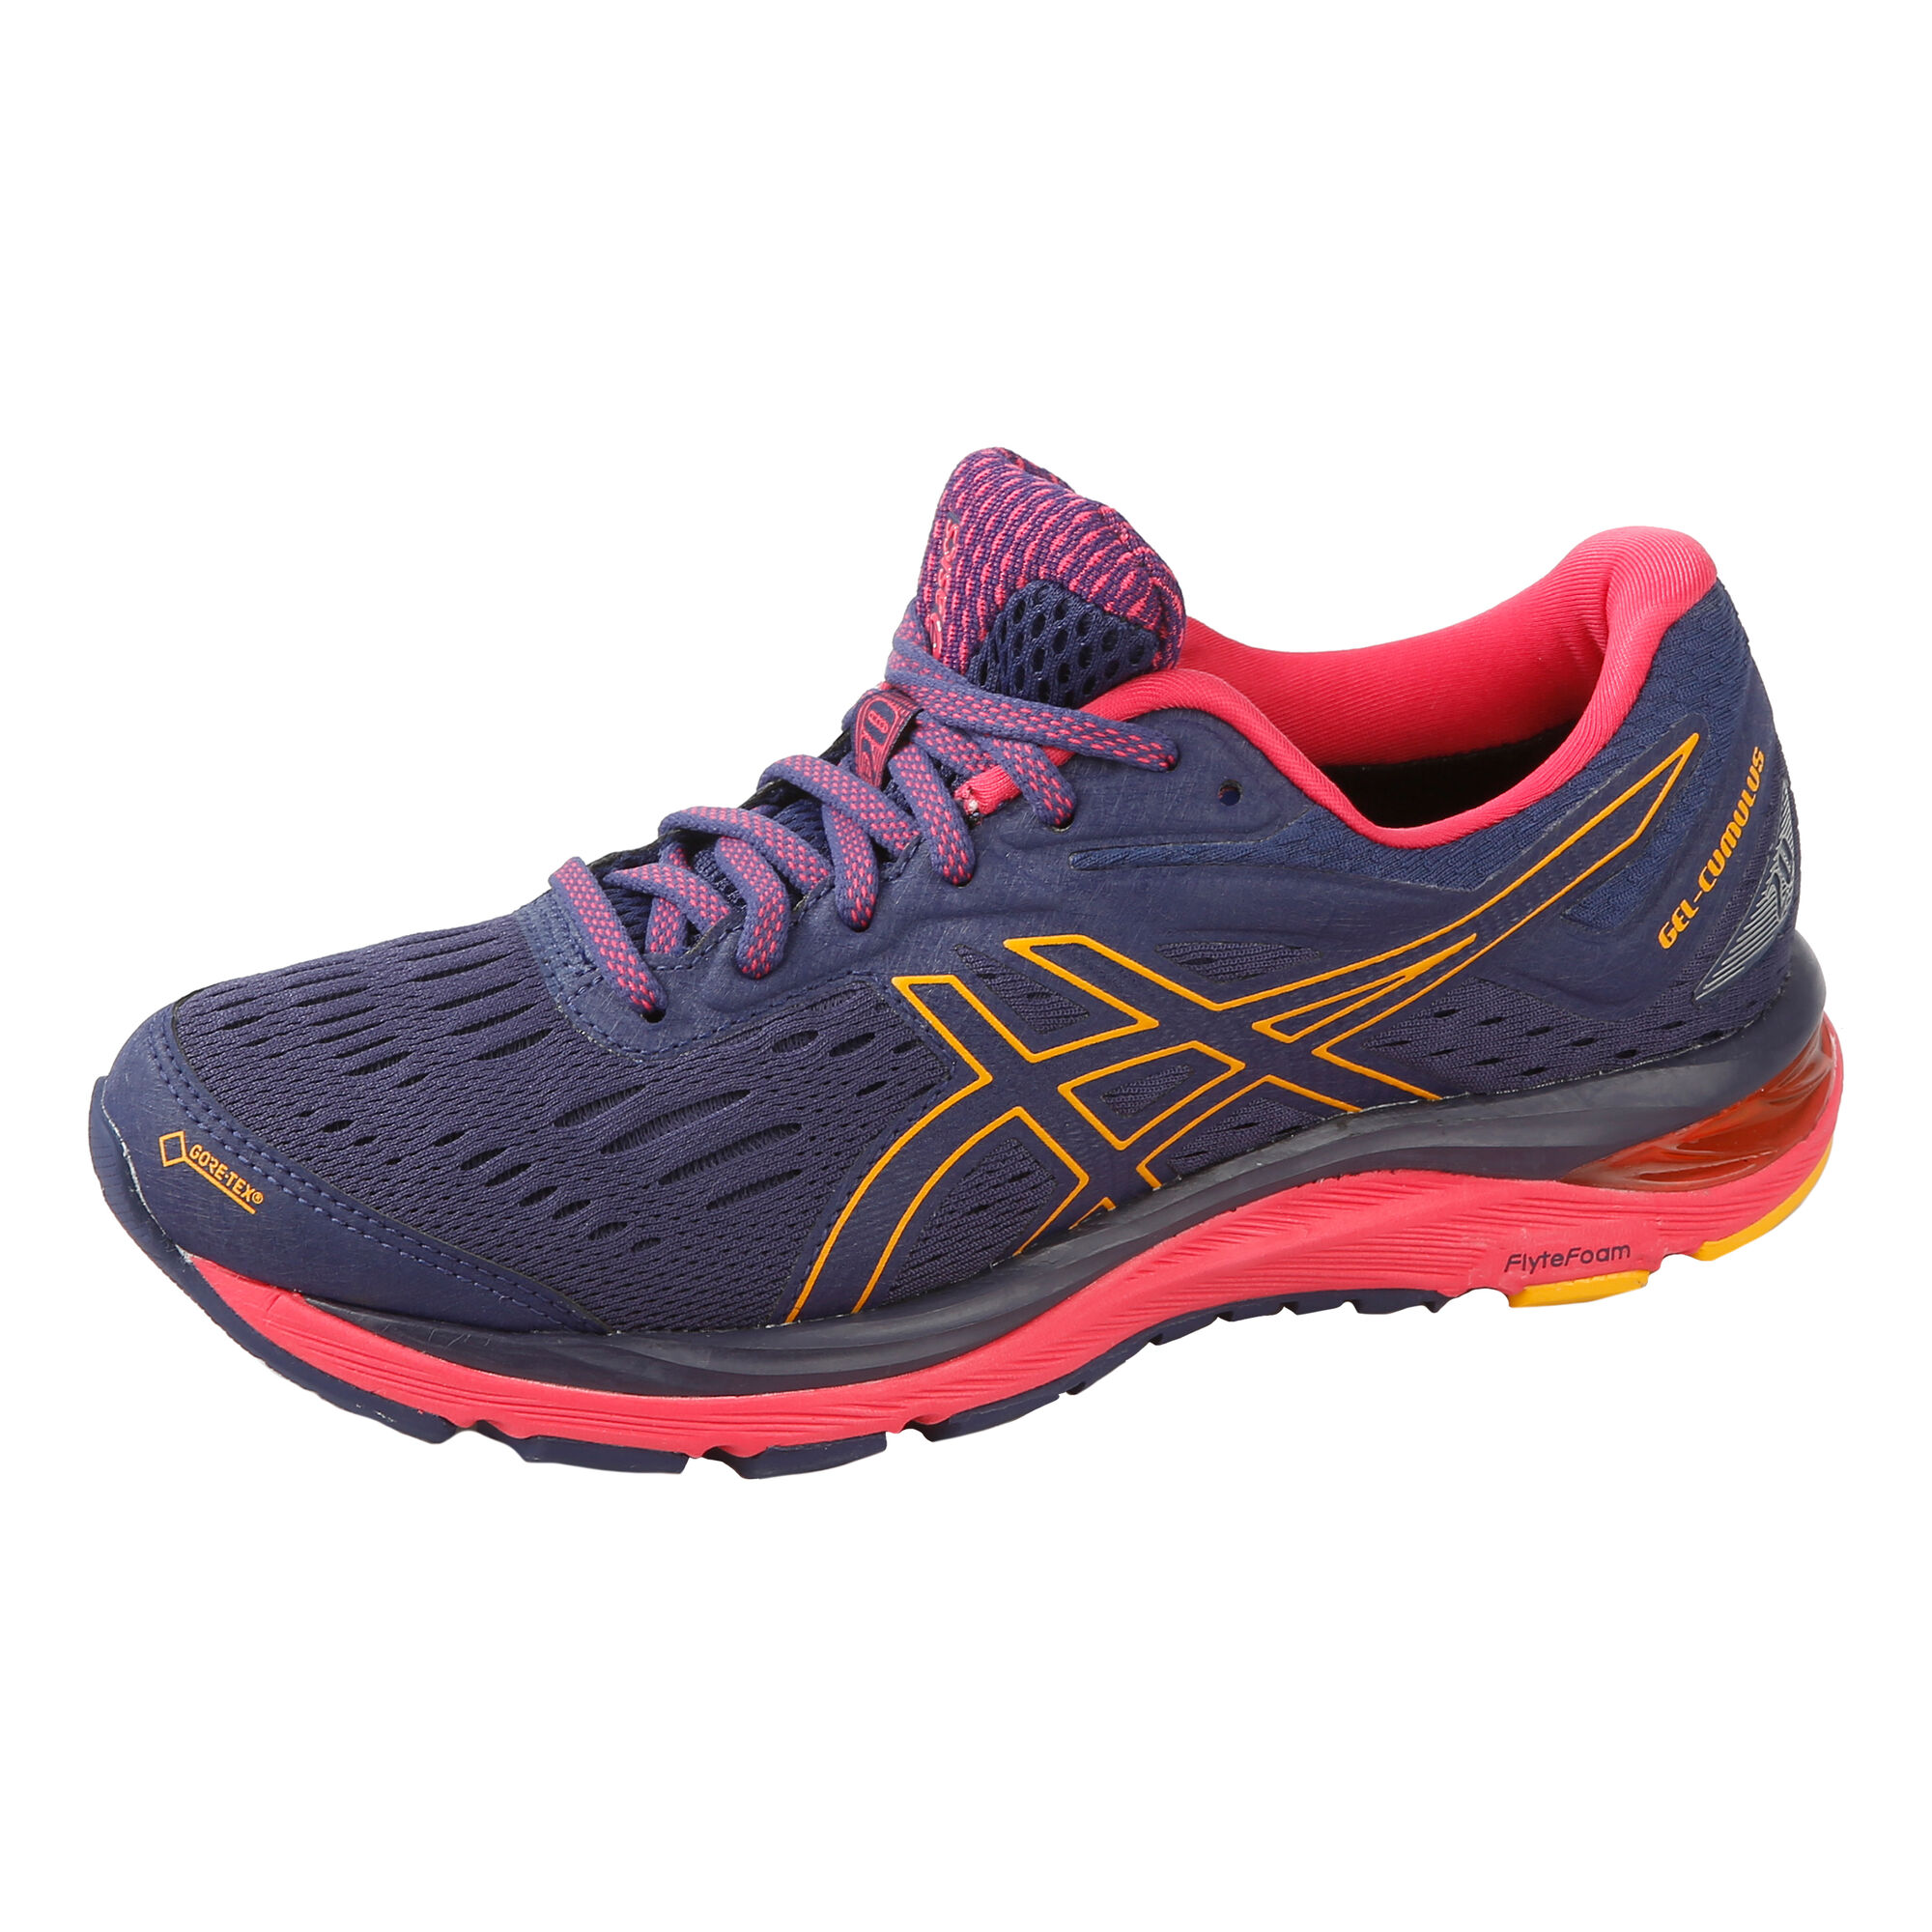 18b92a91 buy Asics Gel-Cumulus 20 G-TX Neutral Running Shoe Women - Dark Blue ...